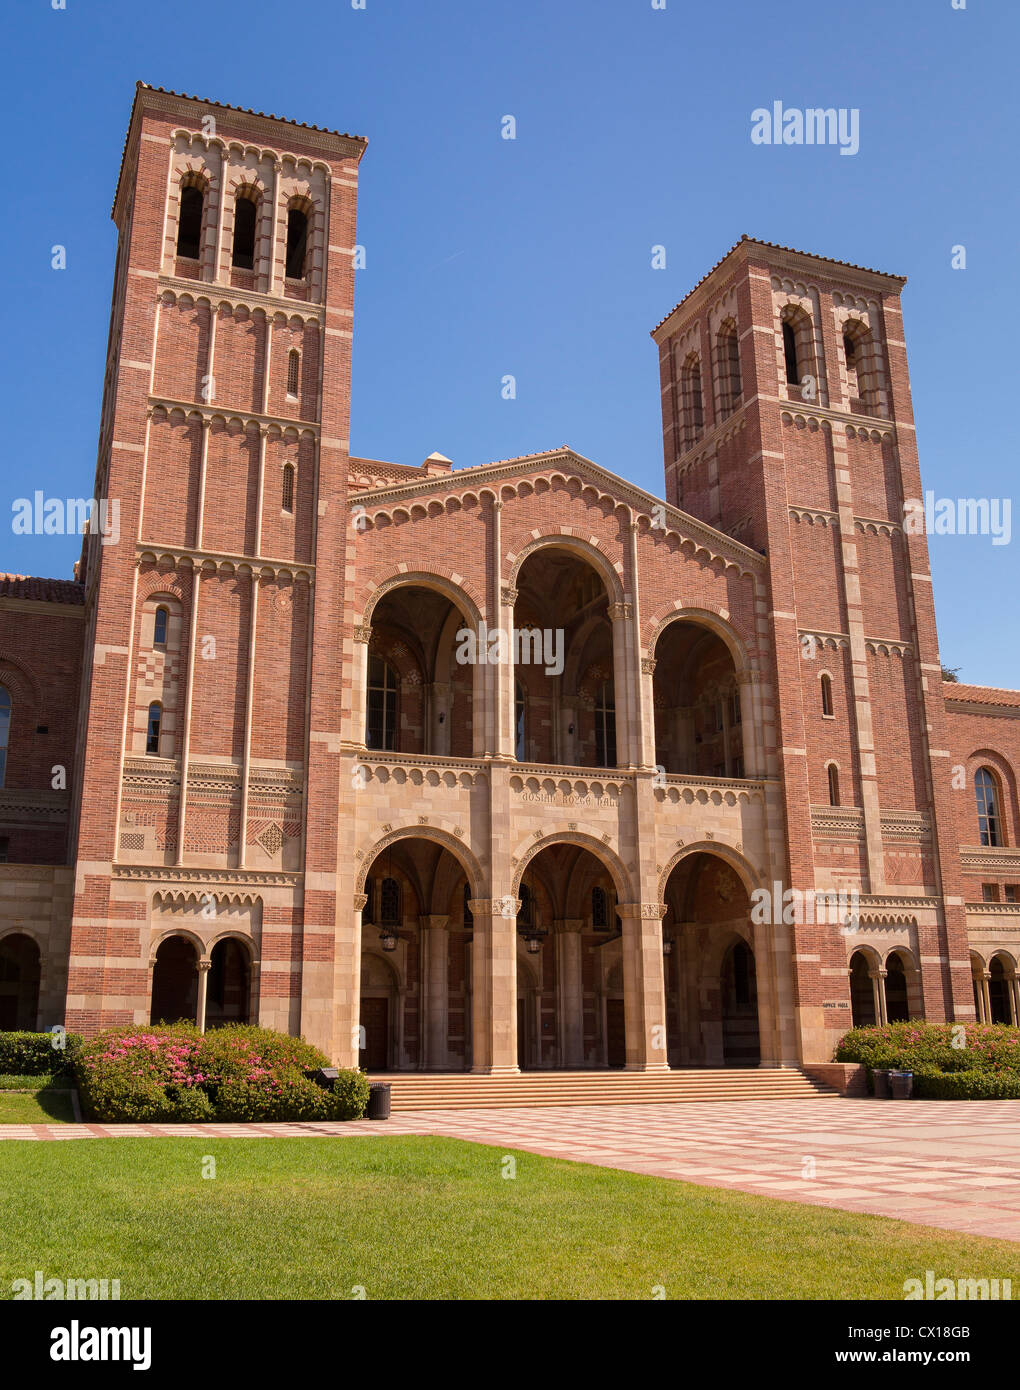 LOS ANGELES, CALIFORNIA, USA - Royce Hall on UCLA campus. - Stock Image